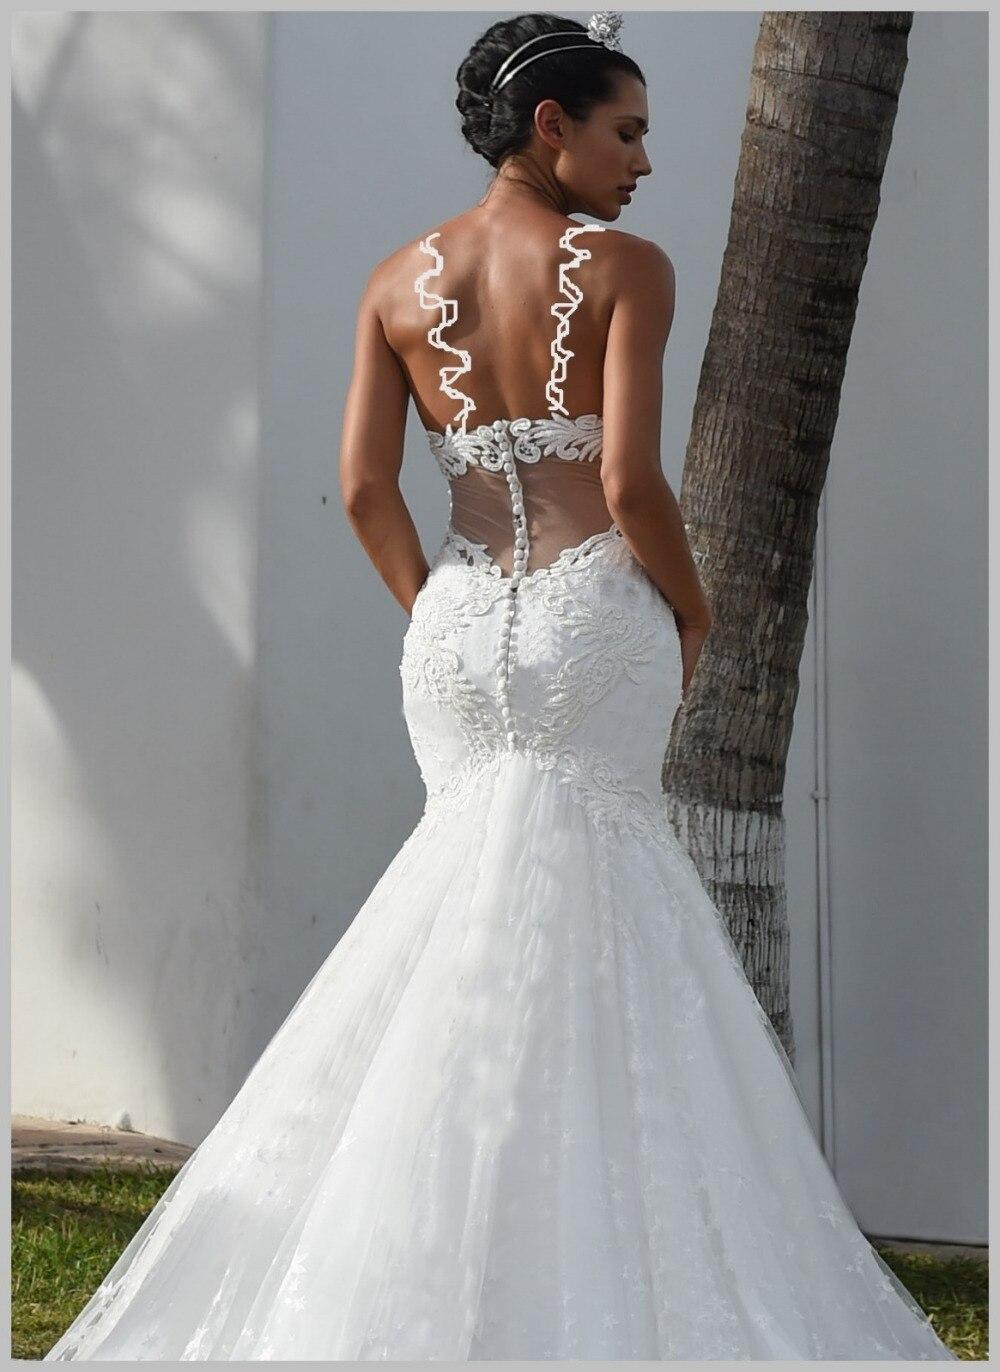 Eslieb High end Wedding dress 2019 Mermaid wedding dresses Vestido de Noiva